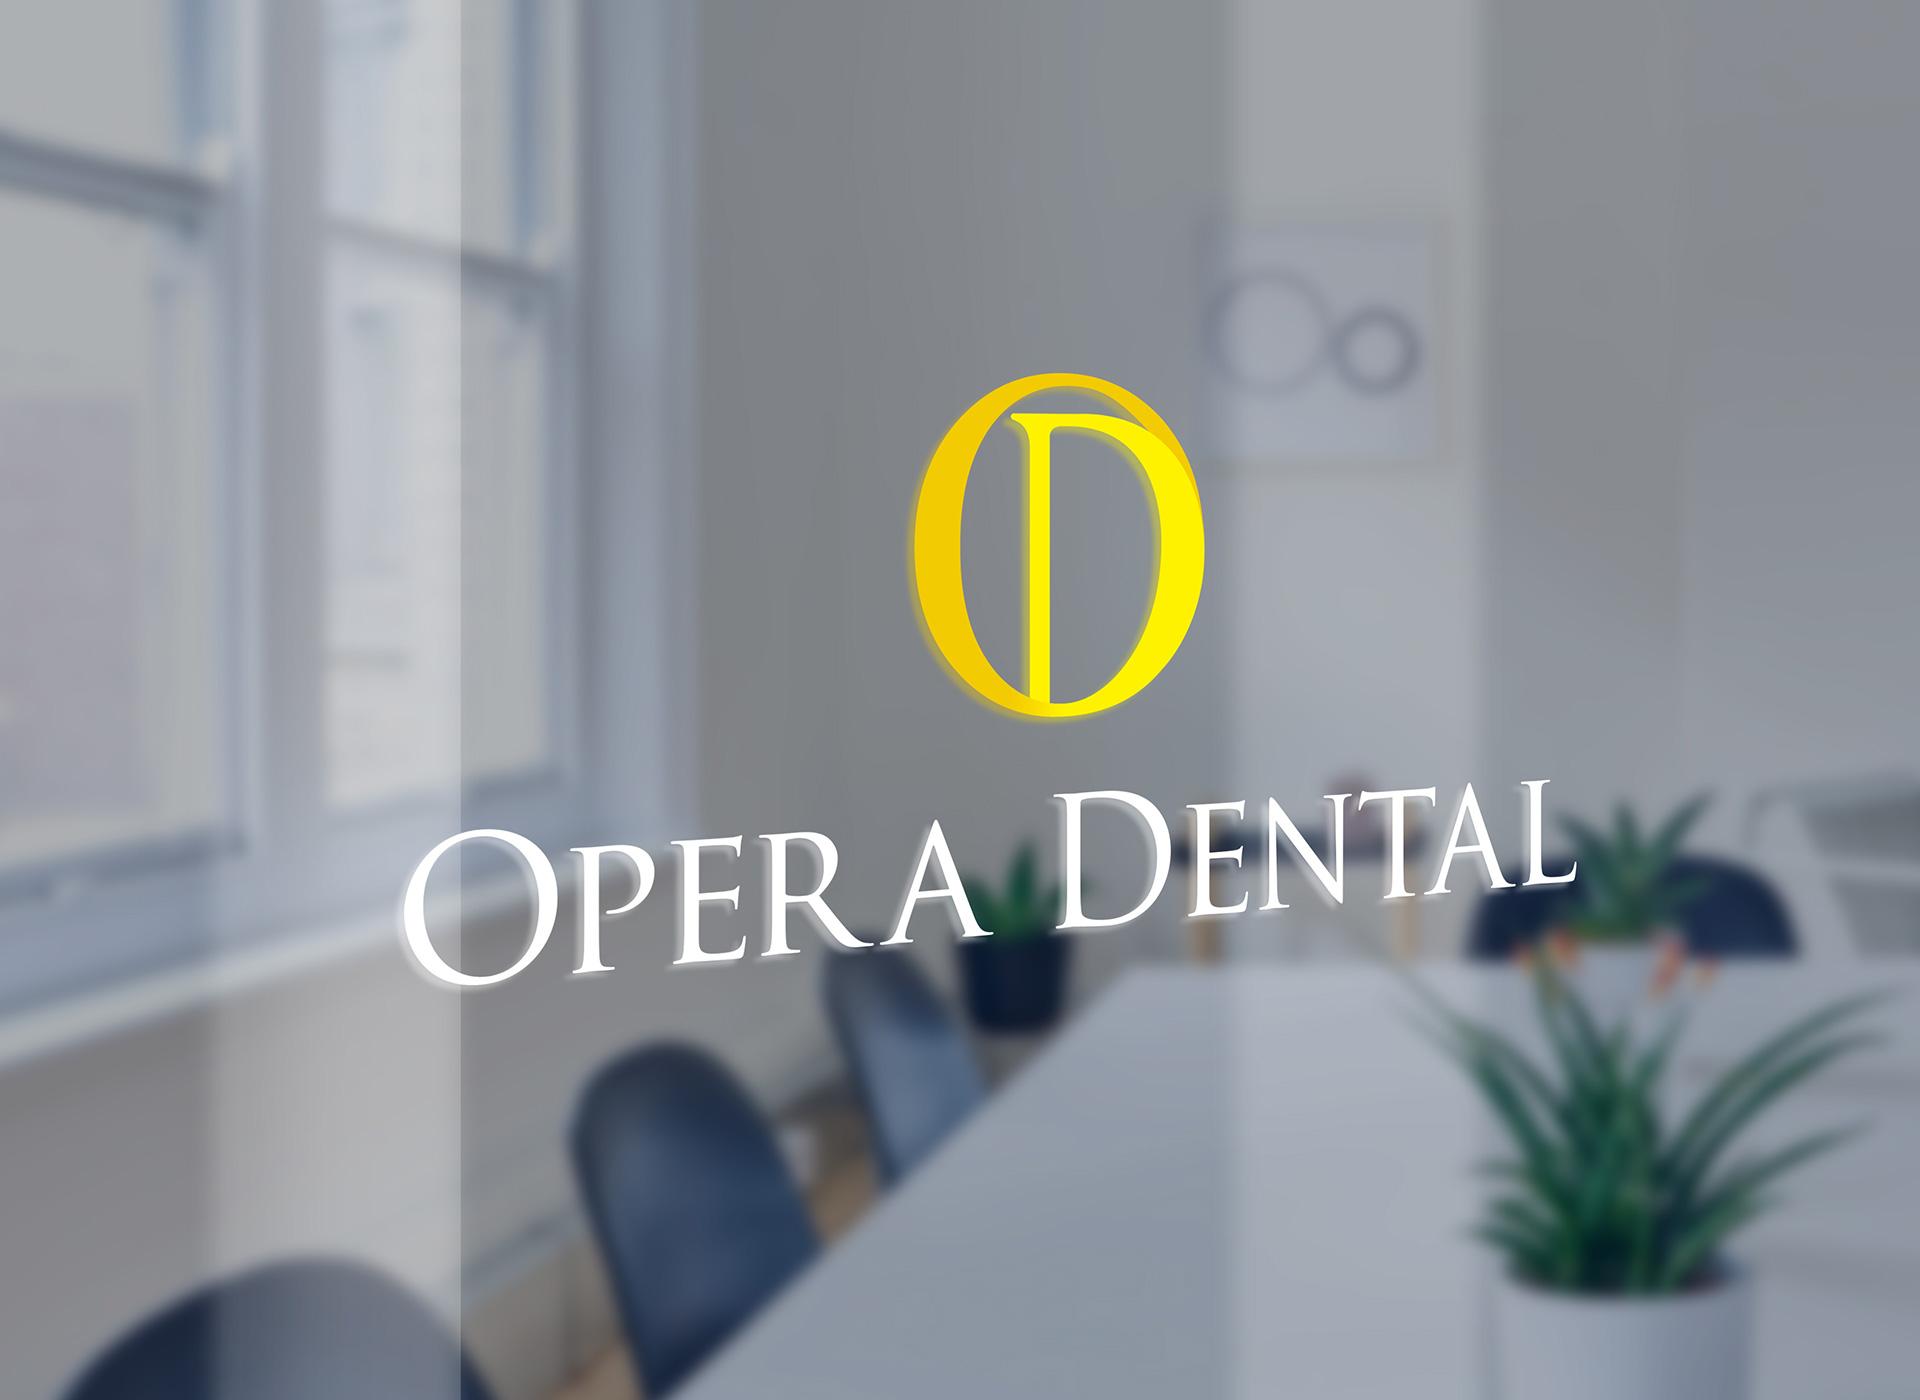 opera dental branding